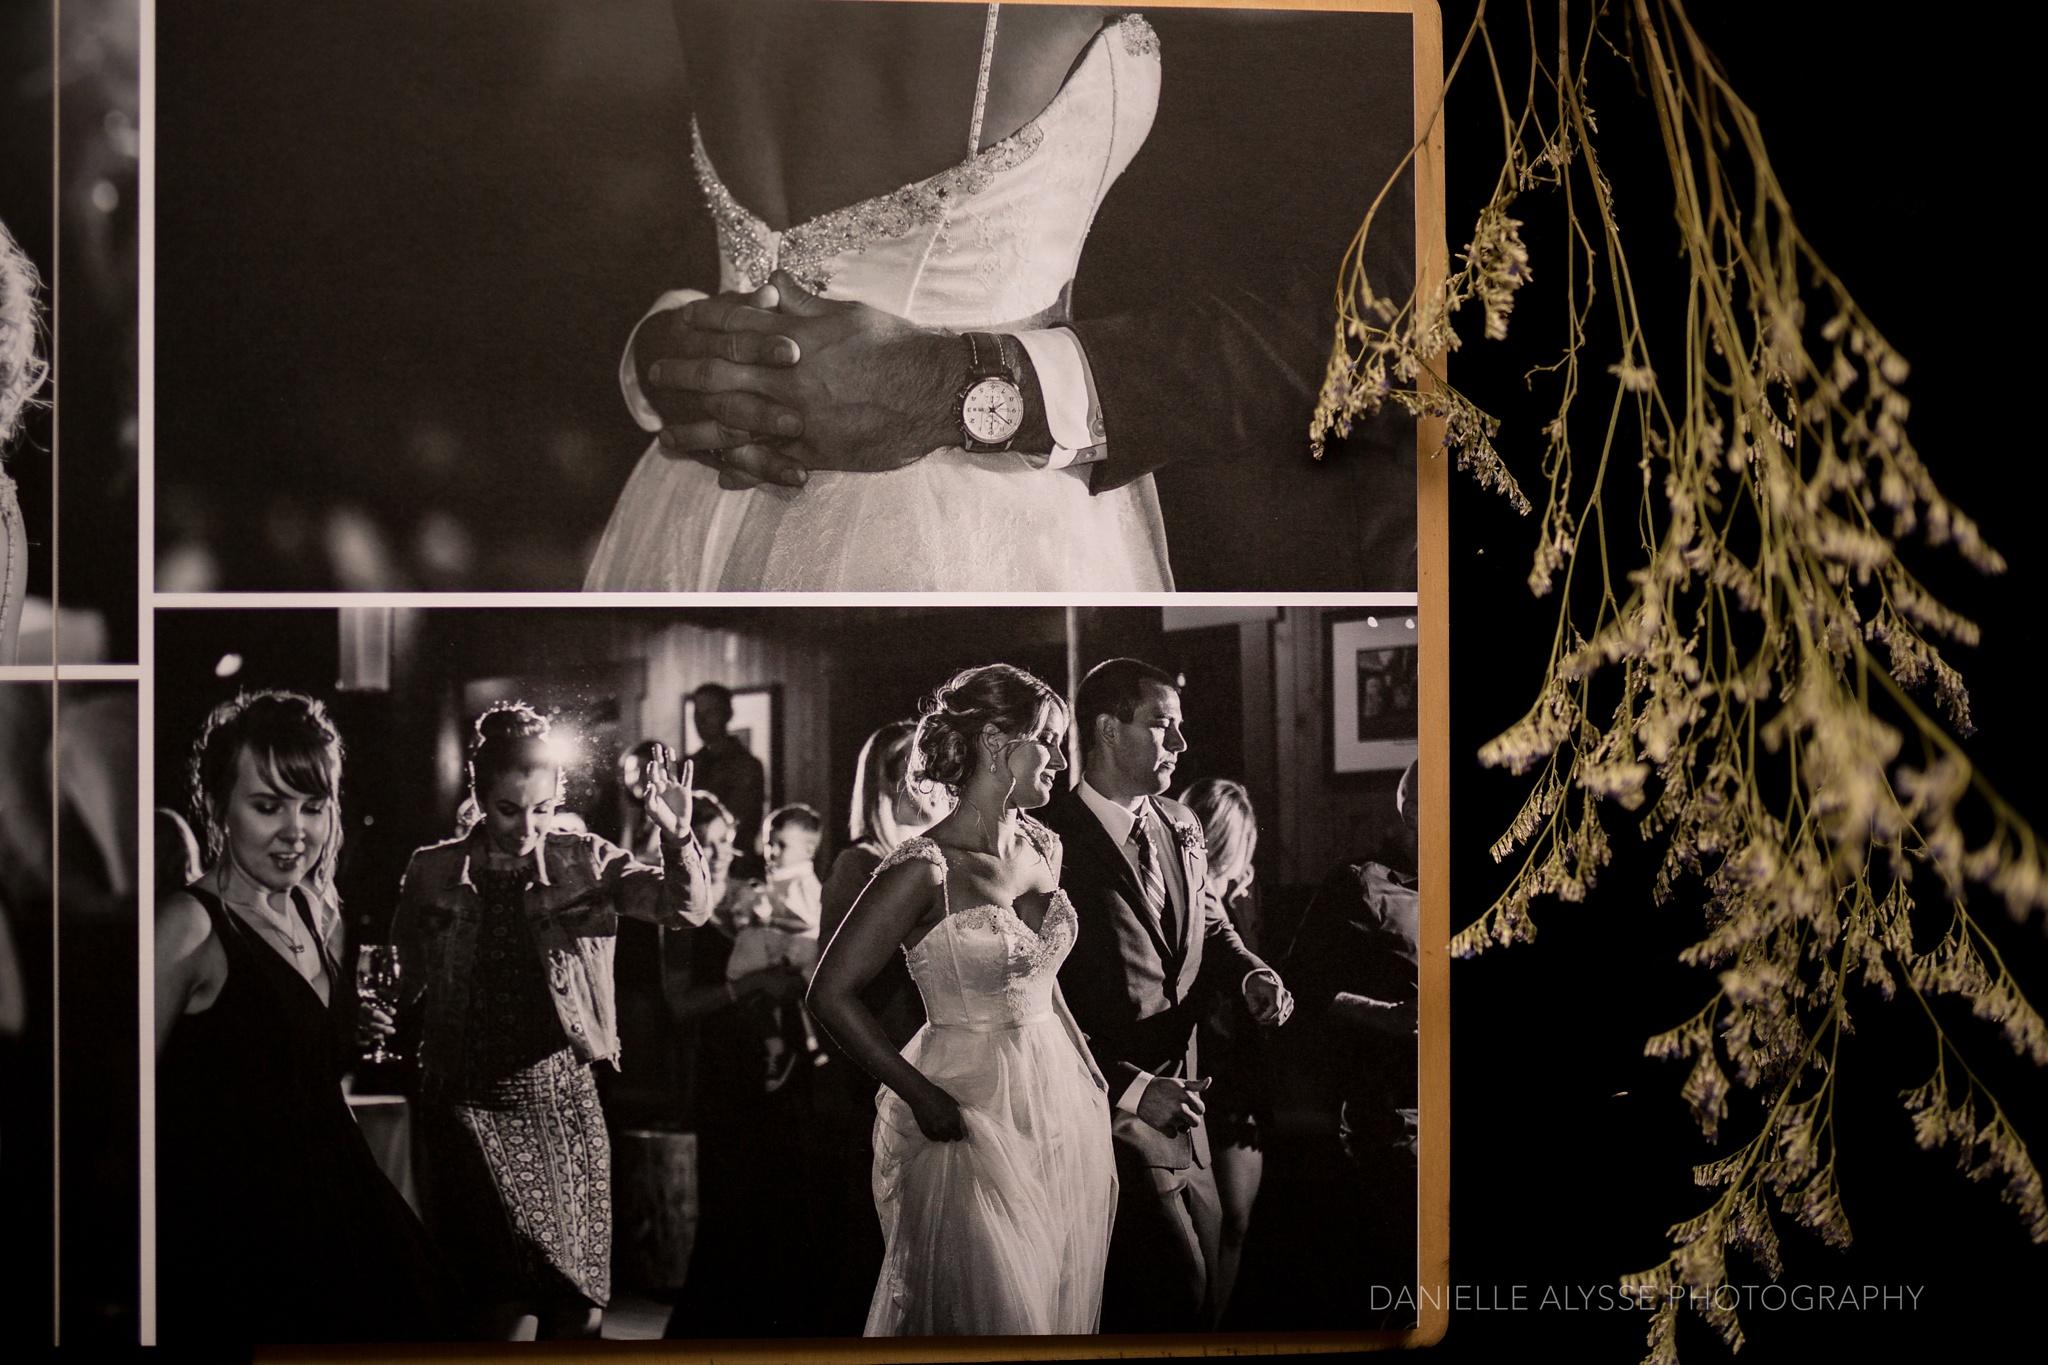 171115_wedding_album_wooden_walnut_leslie_jeremy_bear_valley_lodge_california_danielle_alysse_photography_sacramento_photographer_38_WEB.jpg